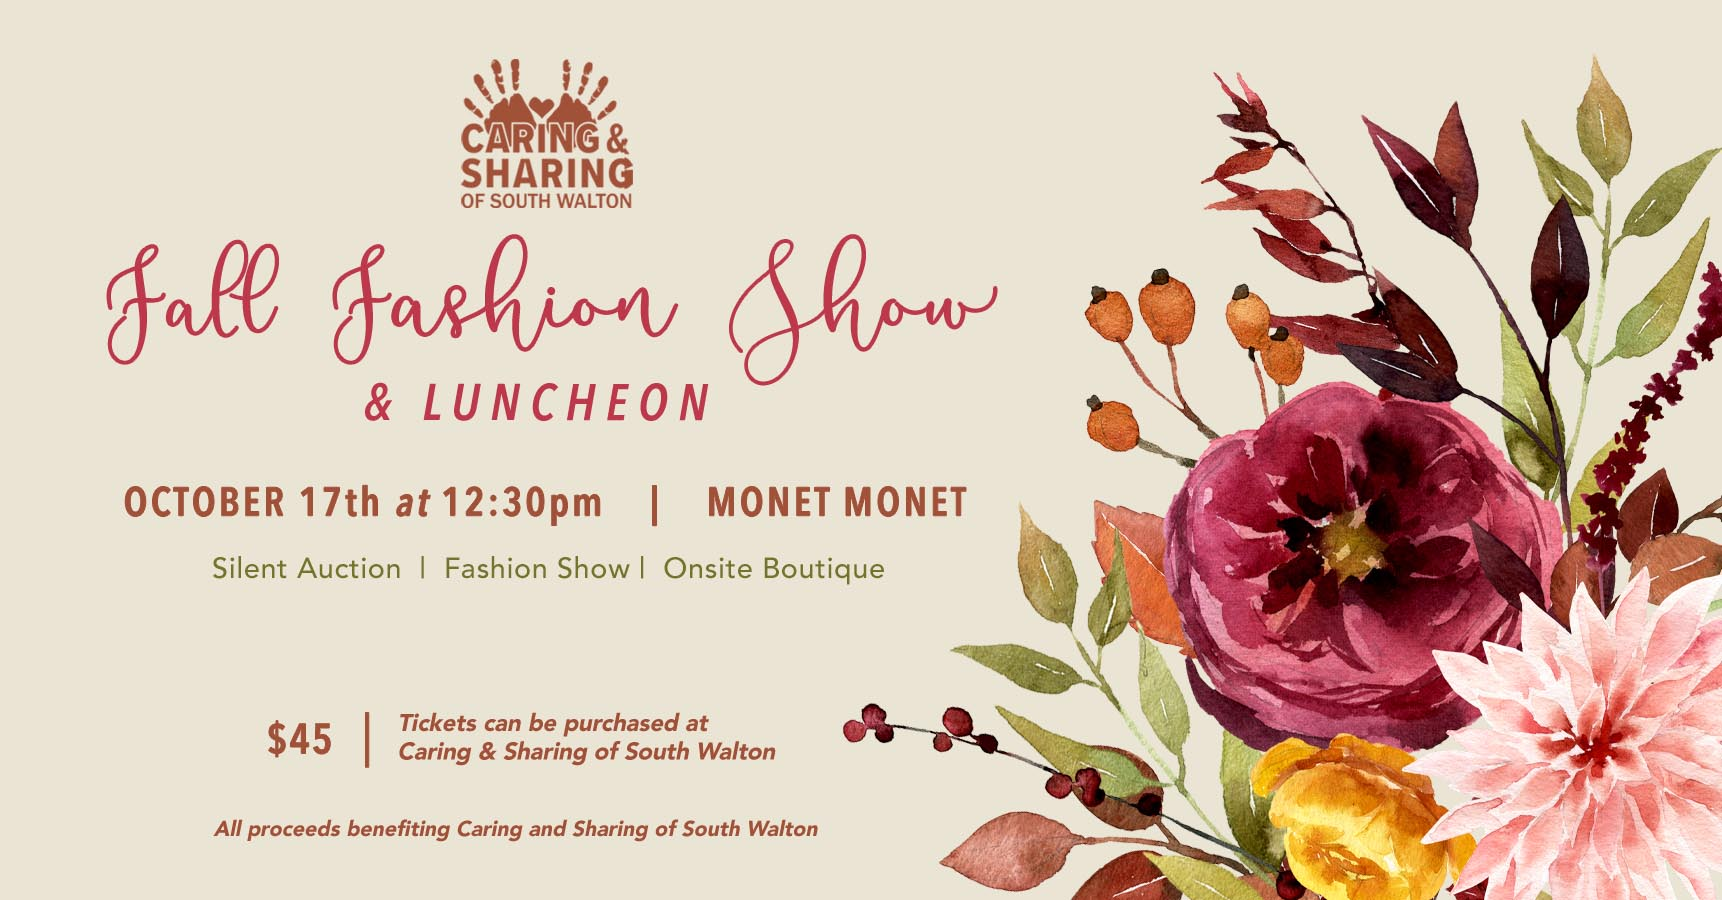 Caring & Sharing of South Walton to hold Fall Fashion Show at Monet Monet